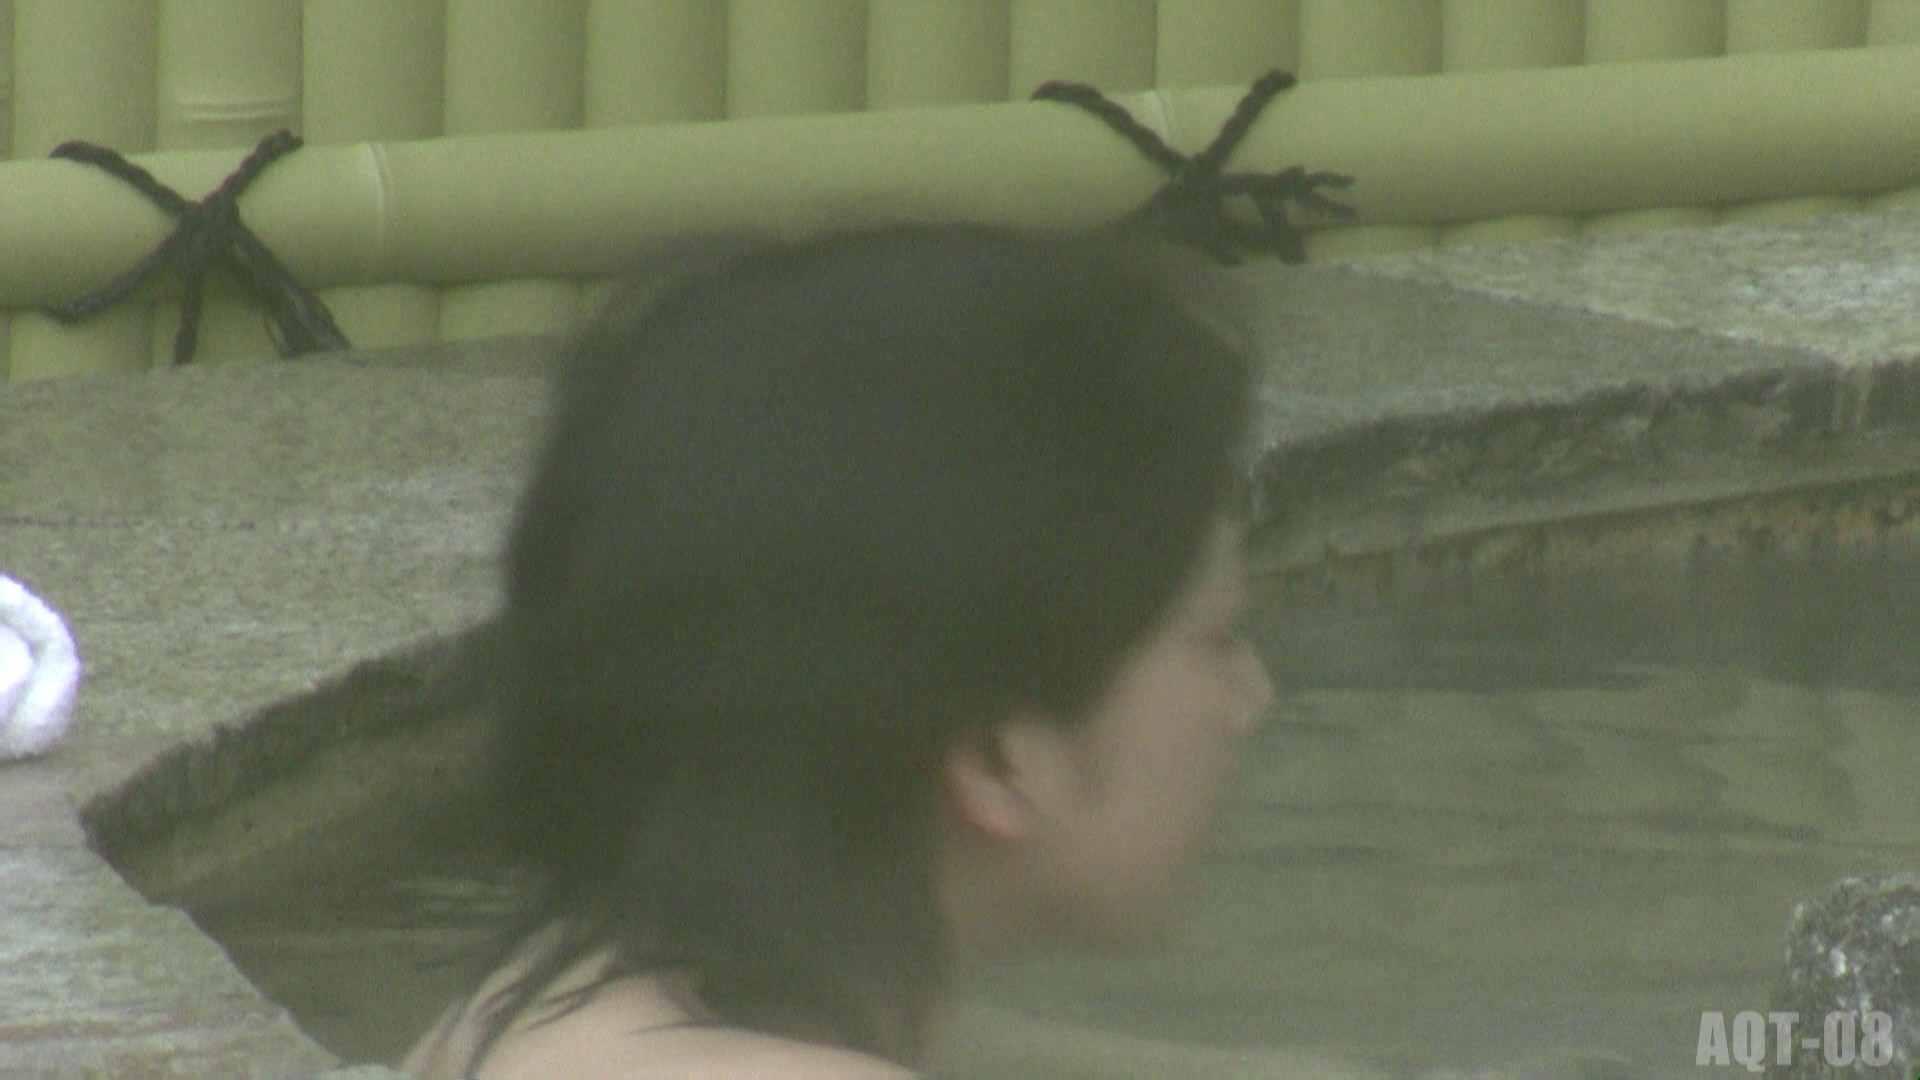 Aquaな露天風呂Vol.776 盗撮 エロ無料画像 108画像 11